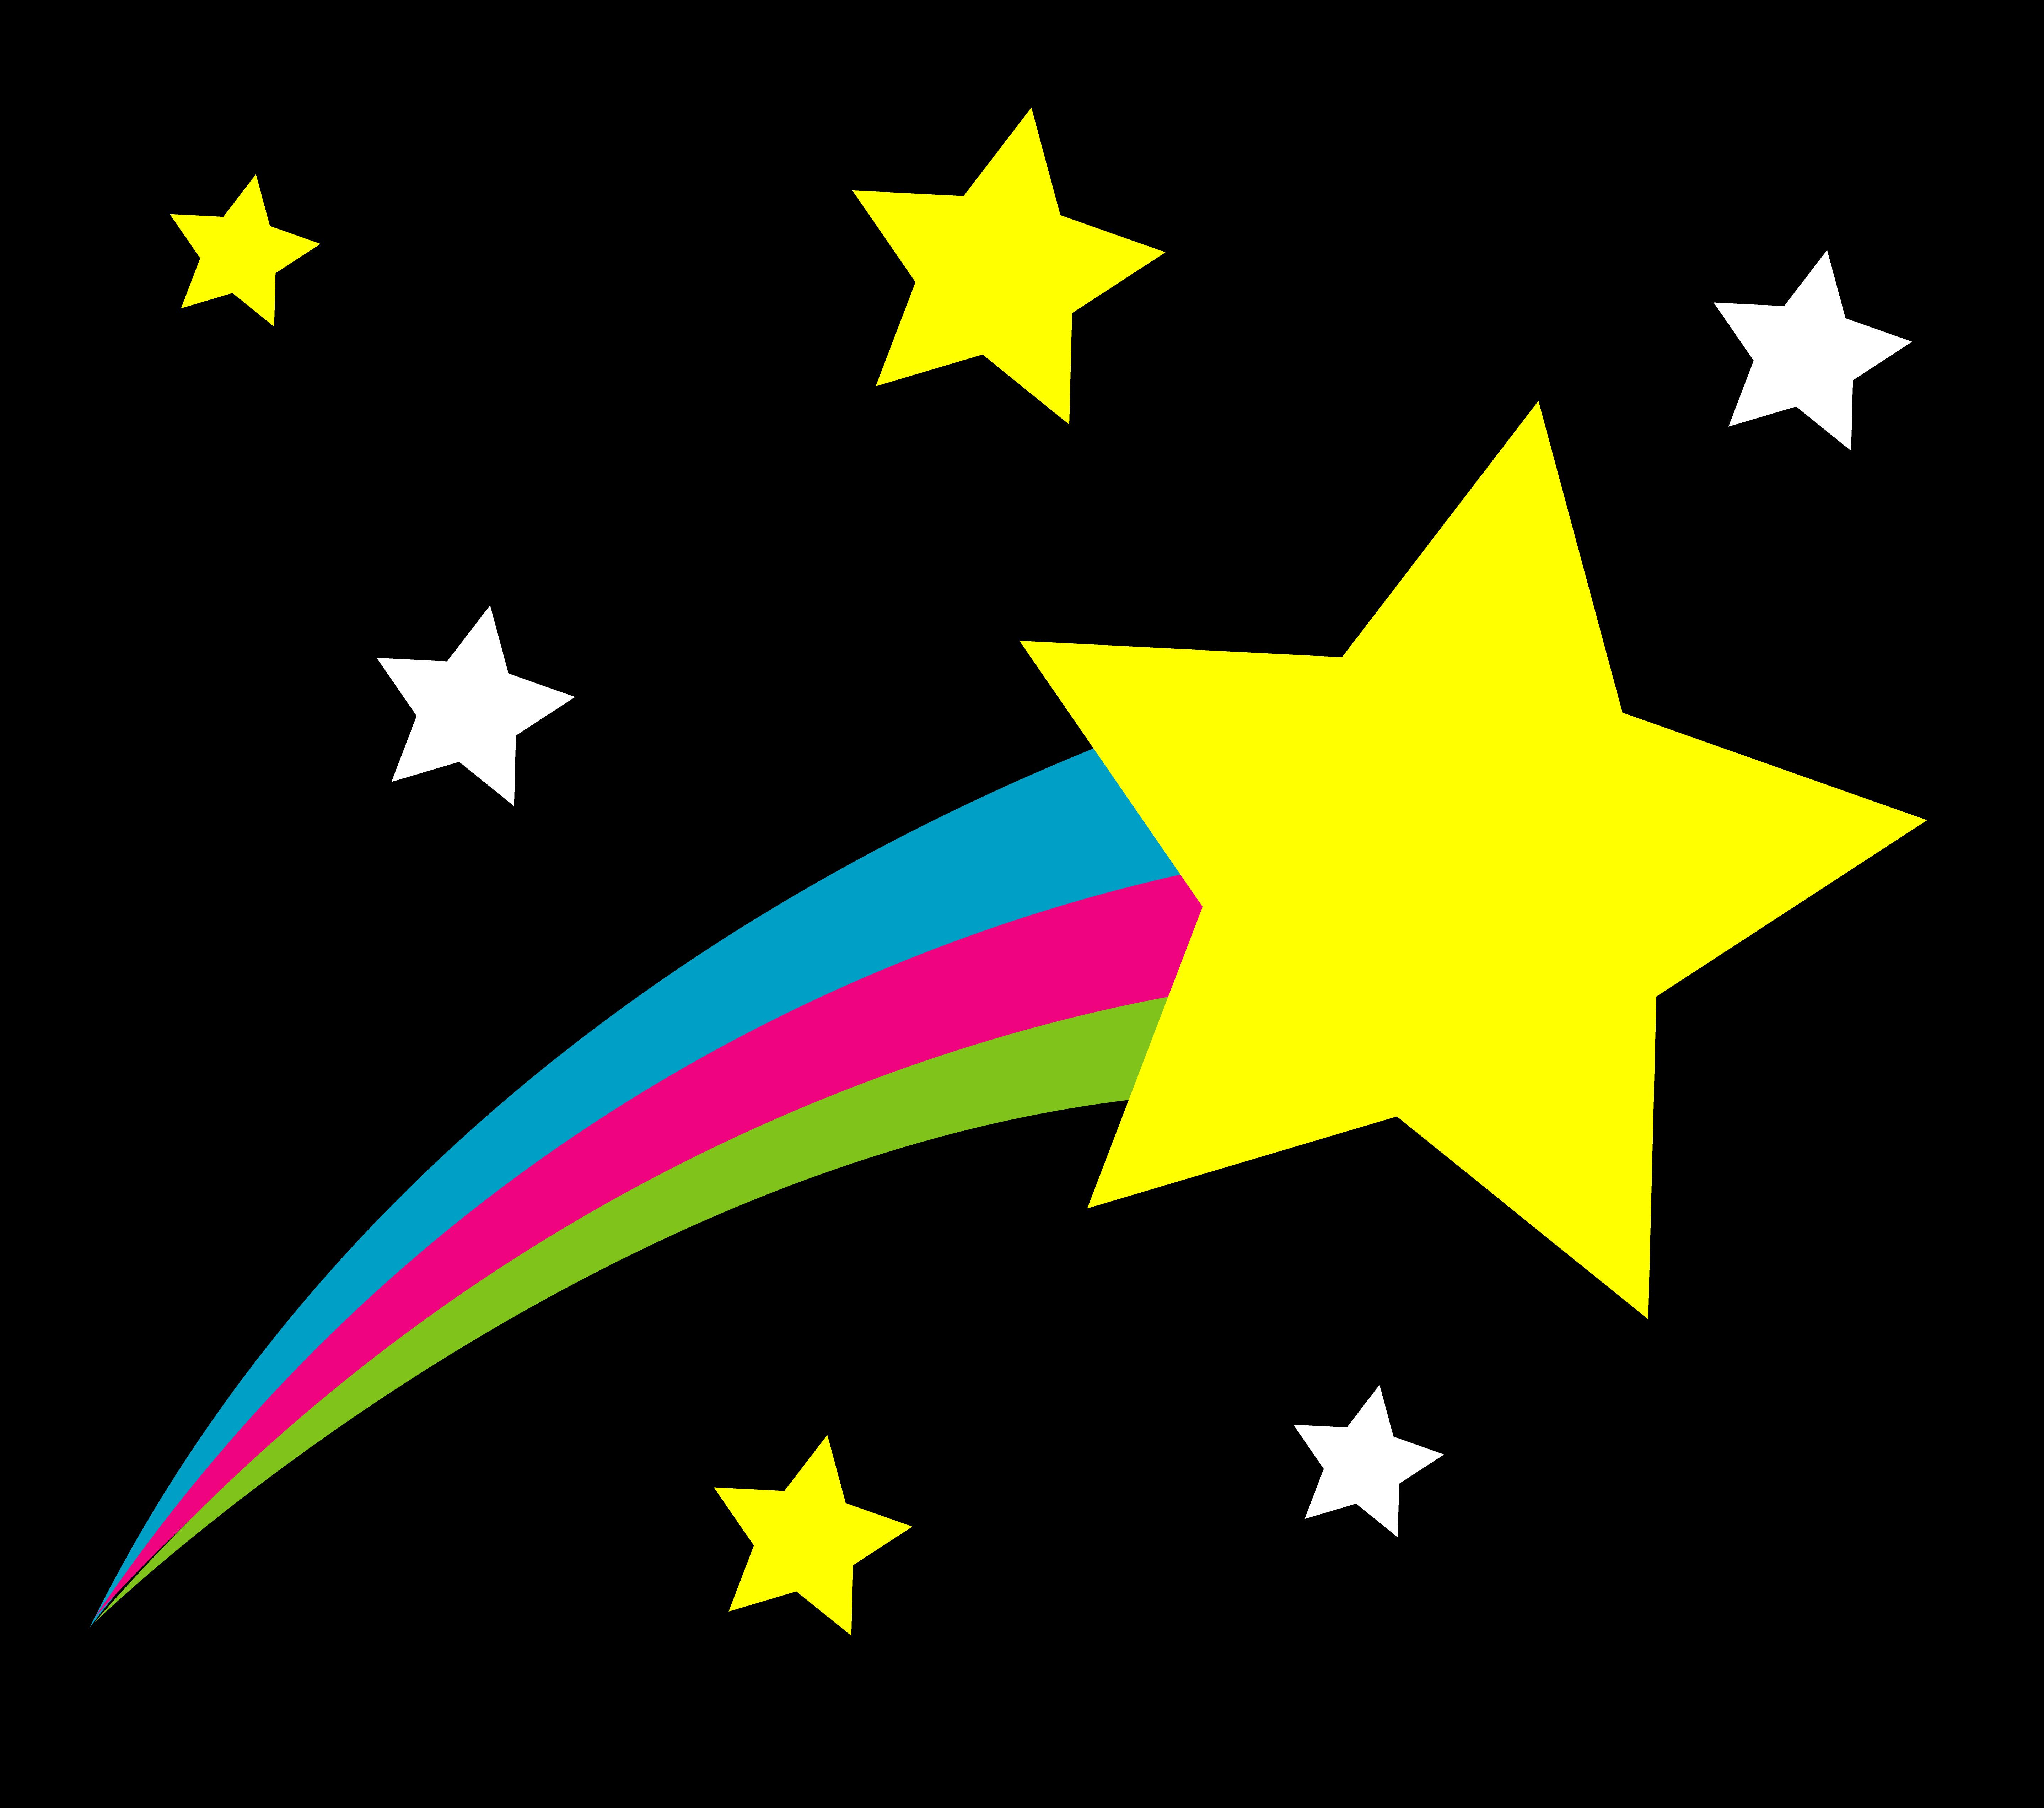 Shooting Star on Night Sky 5752x5089